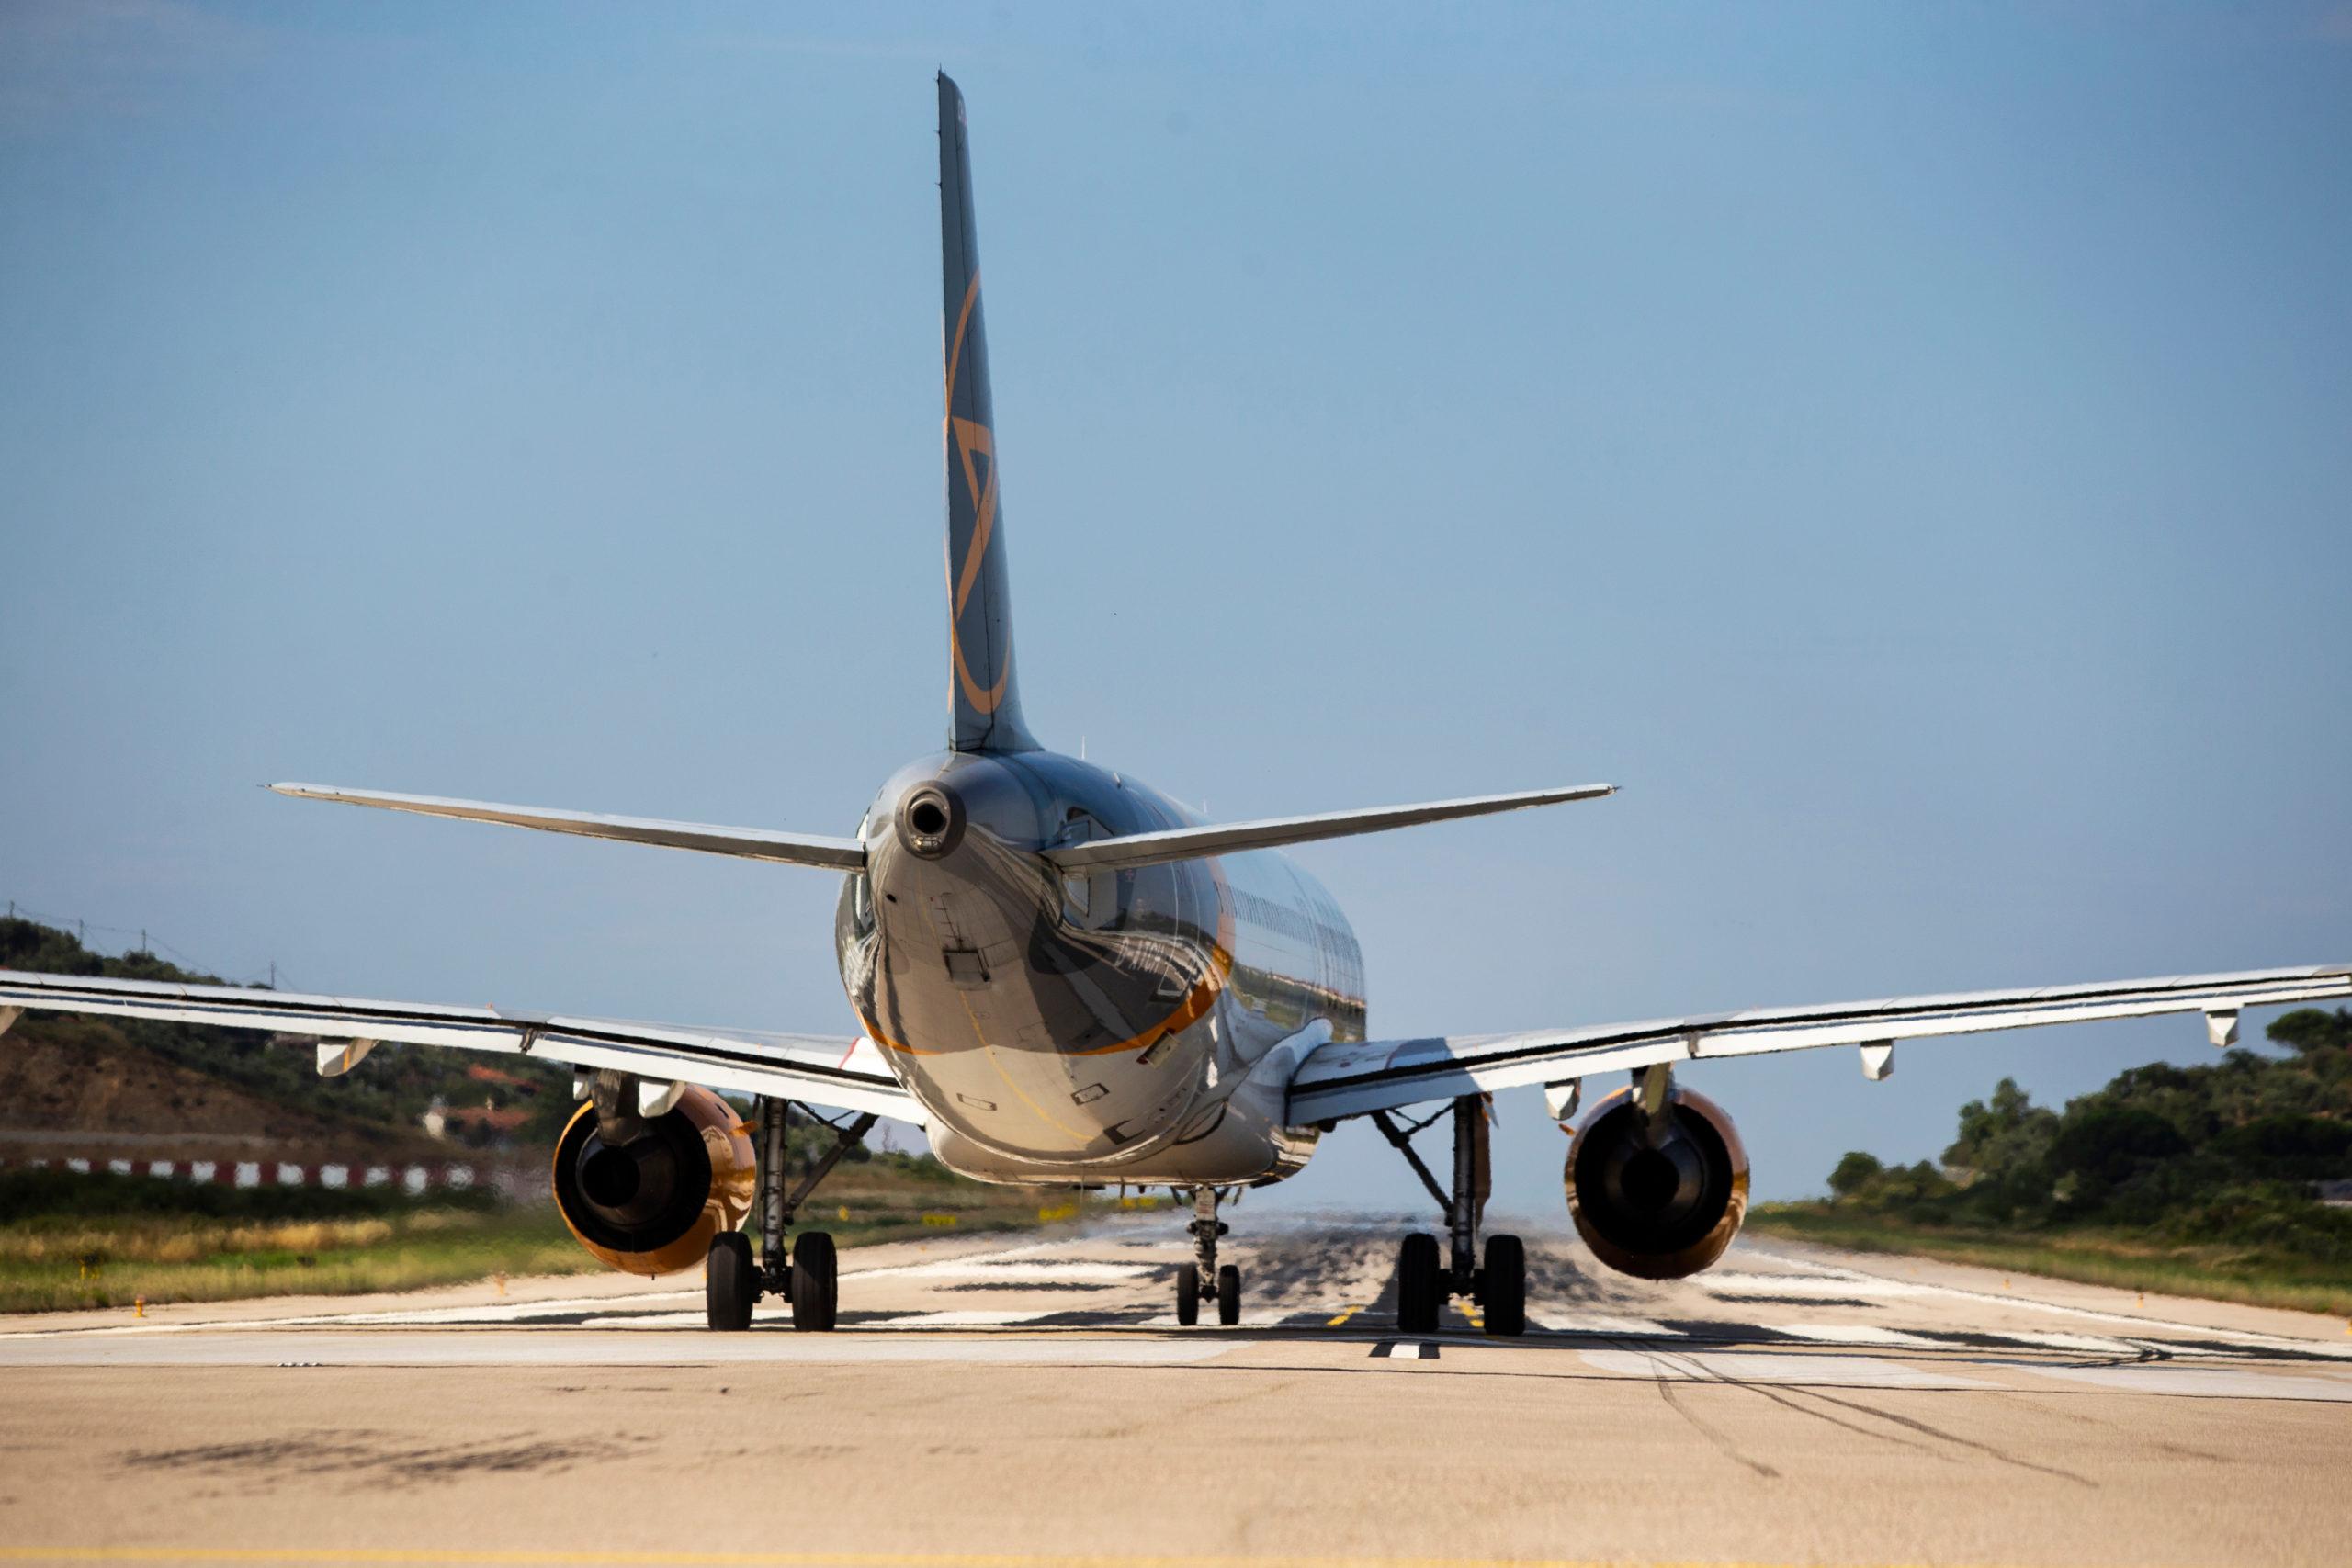 Condor Airbus A320 (D-ATCH)